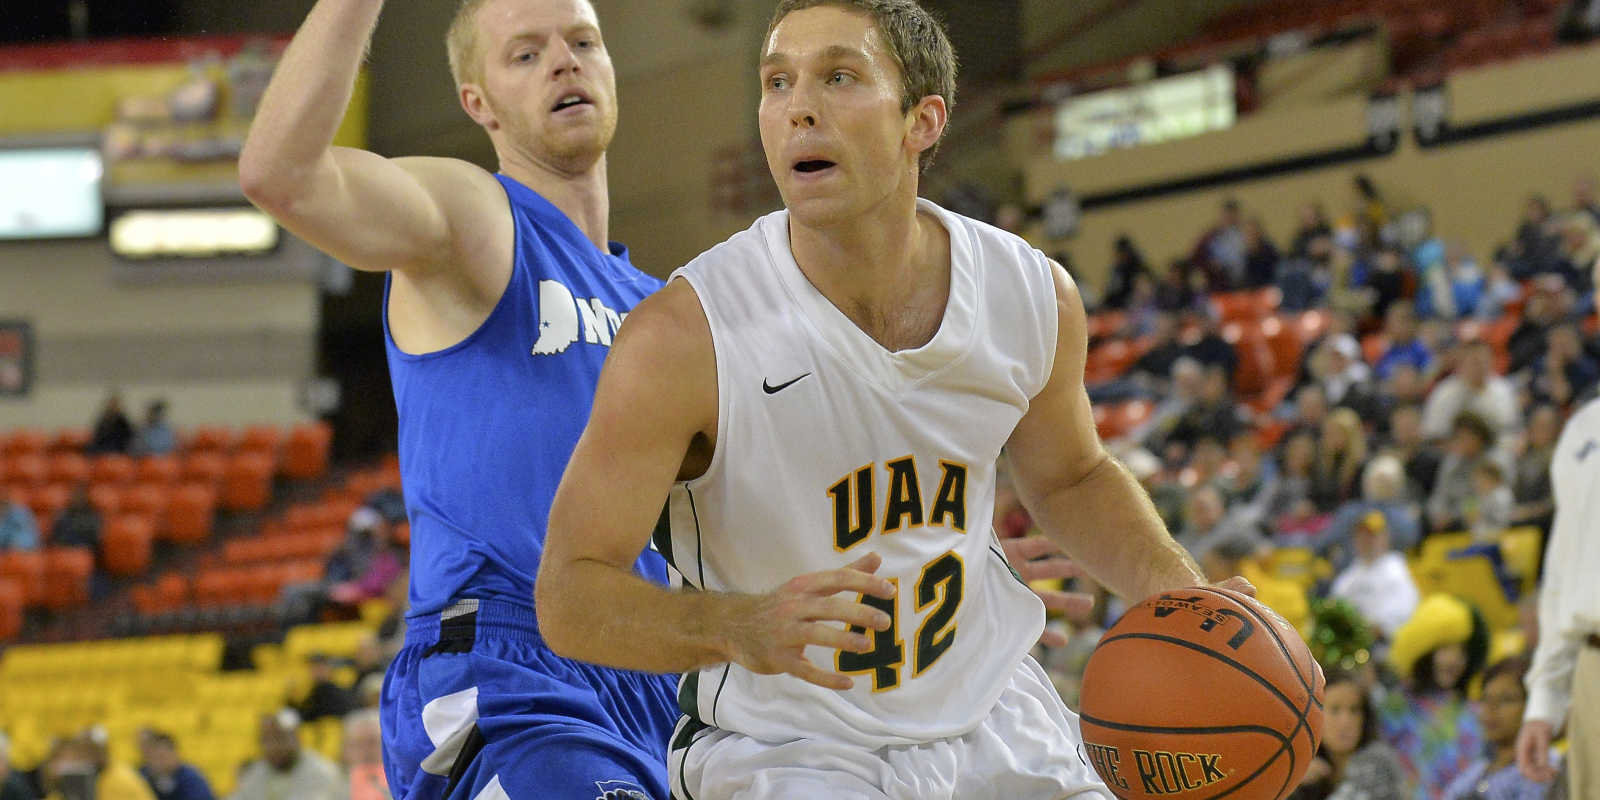 UAA Basketball tournament